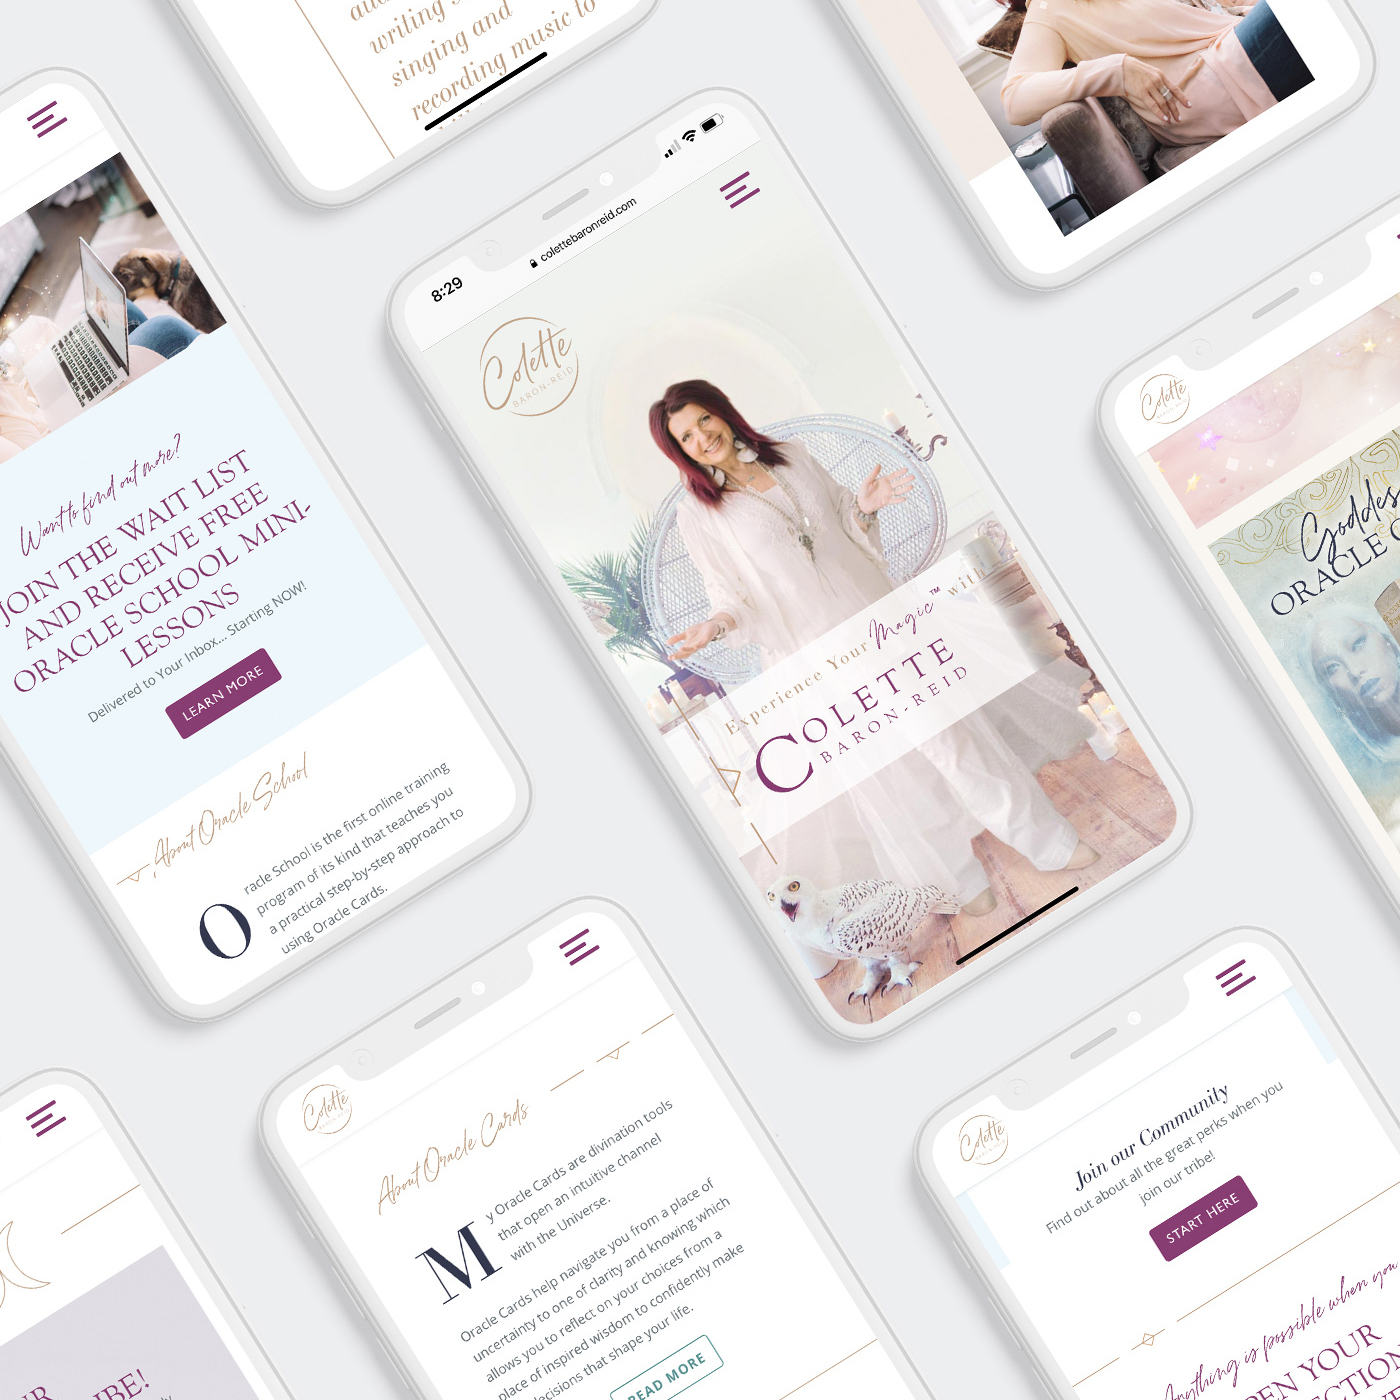 Colette Baron-Reid - Homepage Redesign